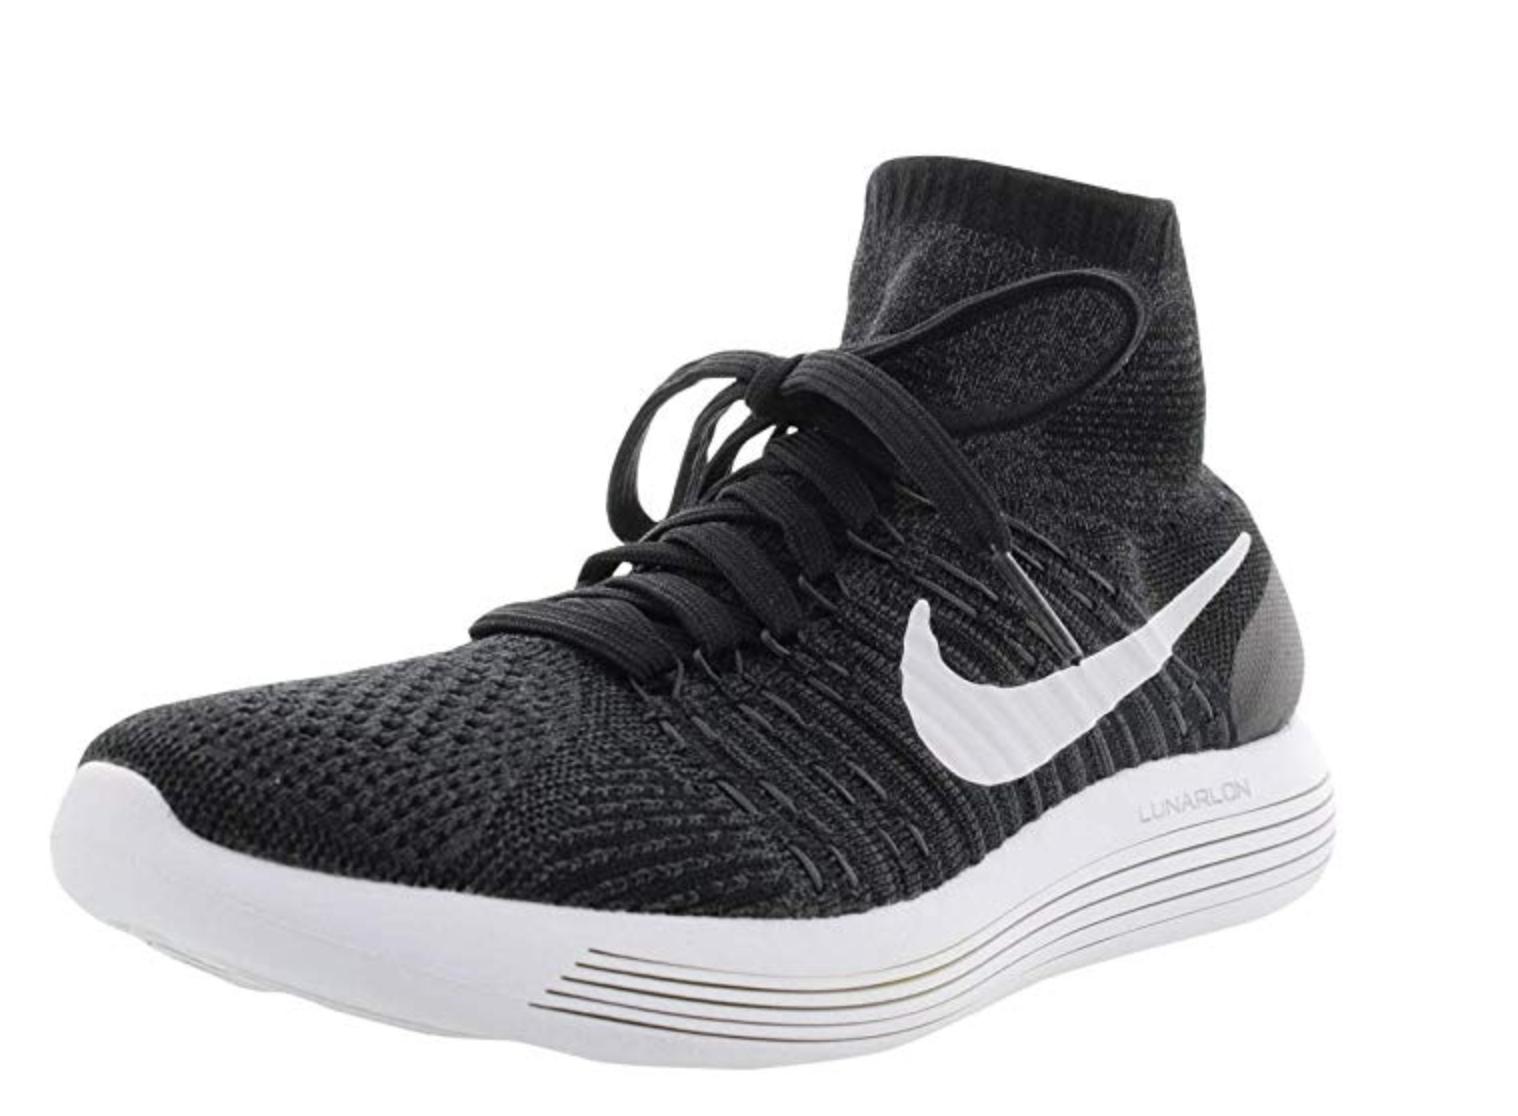 Nike Lunarepic Flyknit Shoes - $125